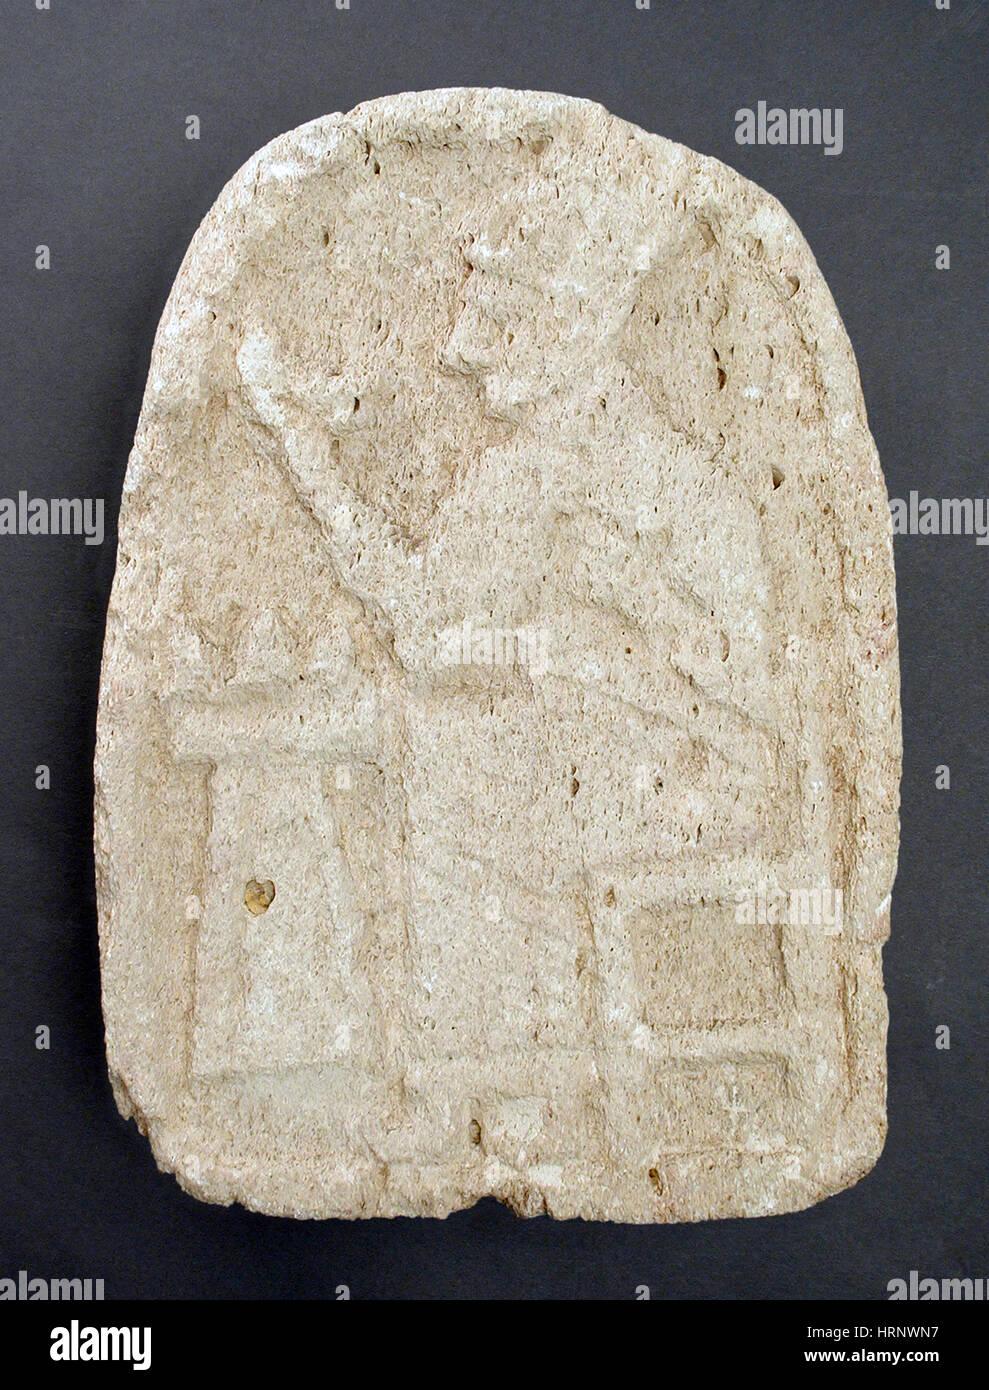 Hittite Bas-Relief, 1400-900 BC - Stock Image